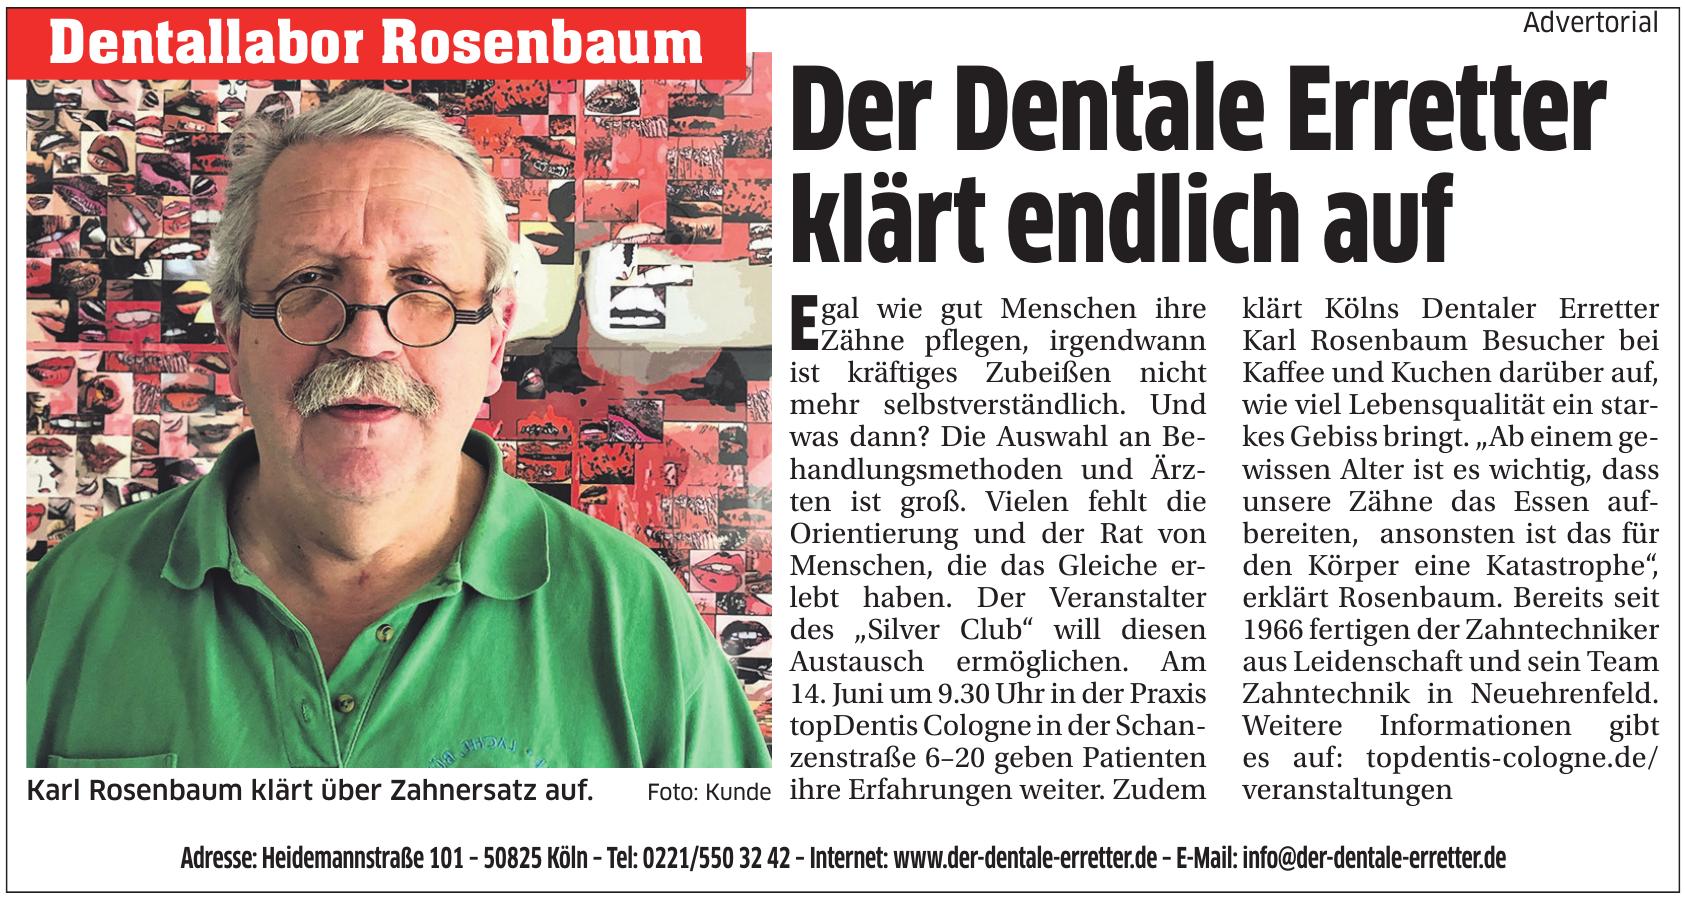 Dentallabor Rosenbaum